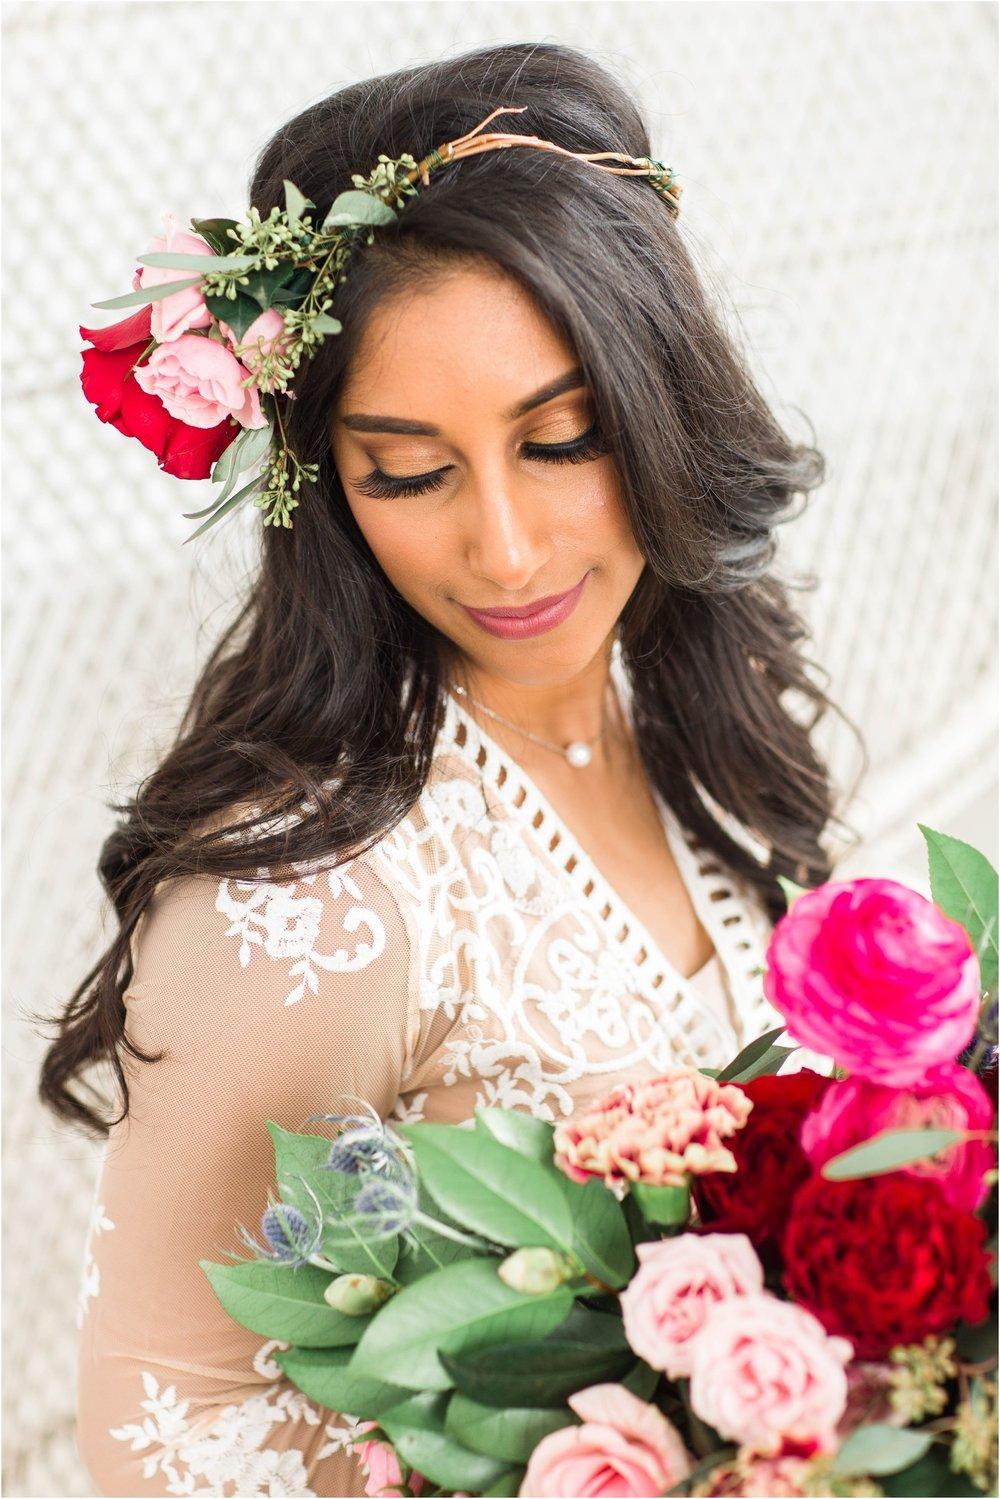 Mint-Room-Studios-Anniversary-Session-Toronto-Mississauga-Brampton-Scarborough-GTA-Pakistani-Indian-Wedding-Engagement-Photographer-Photography_0007.jpg